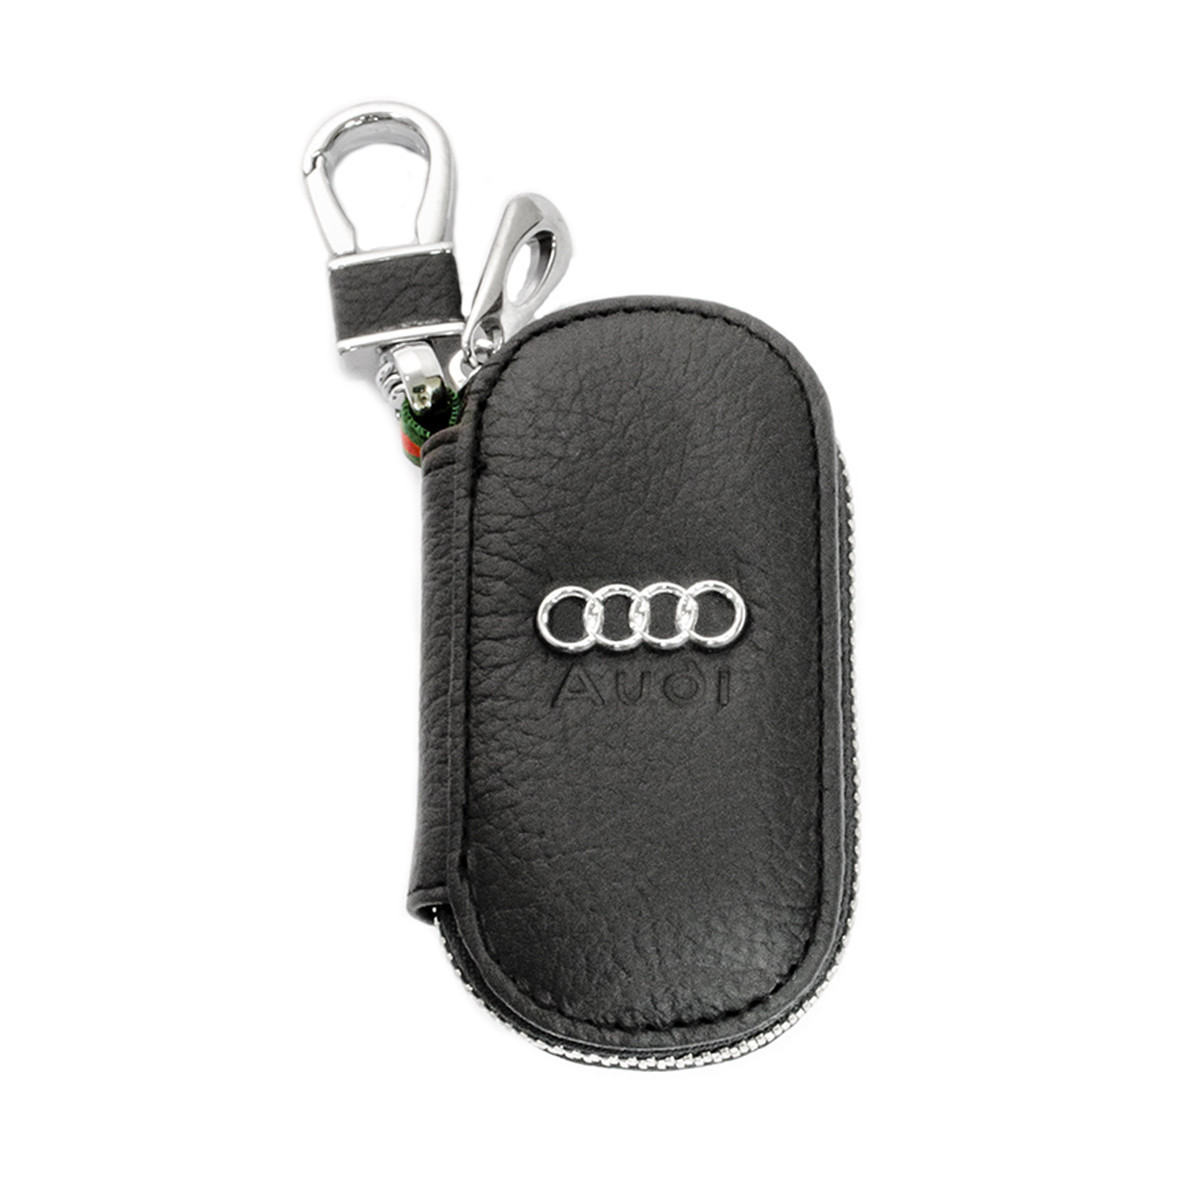 Ключница Carss с логотипом AUDI 01003 черная